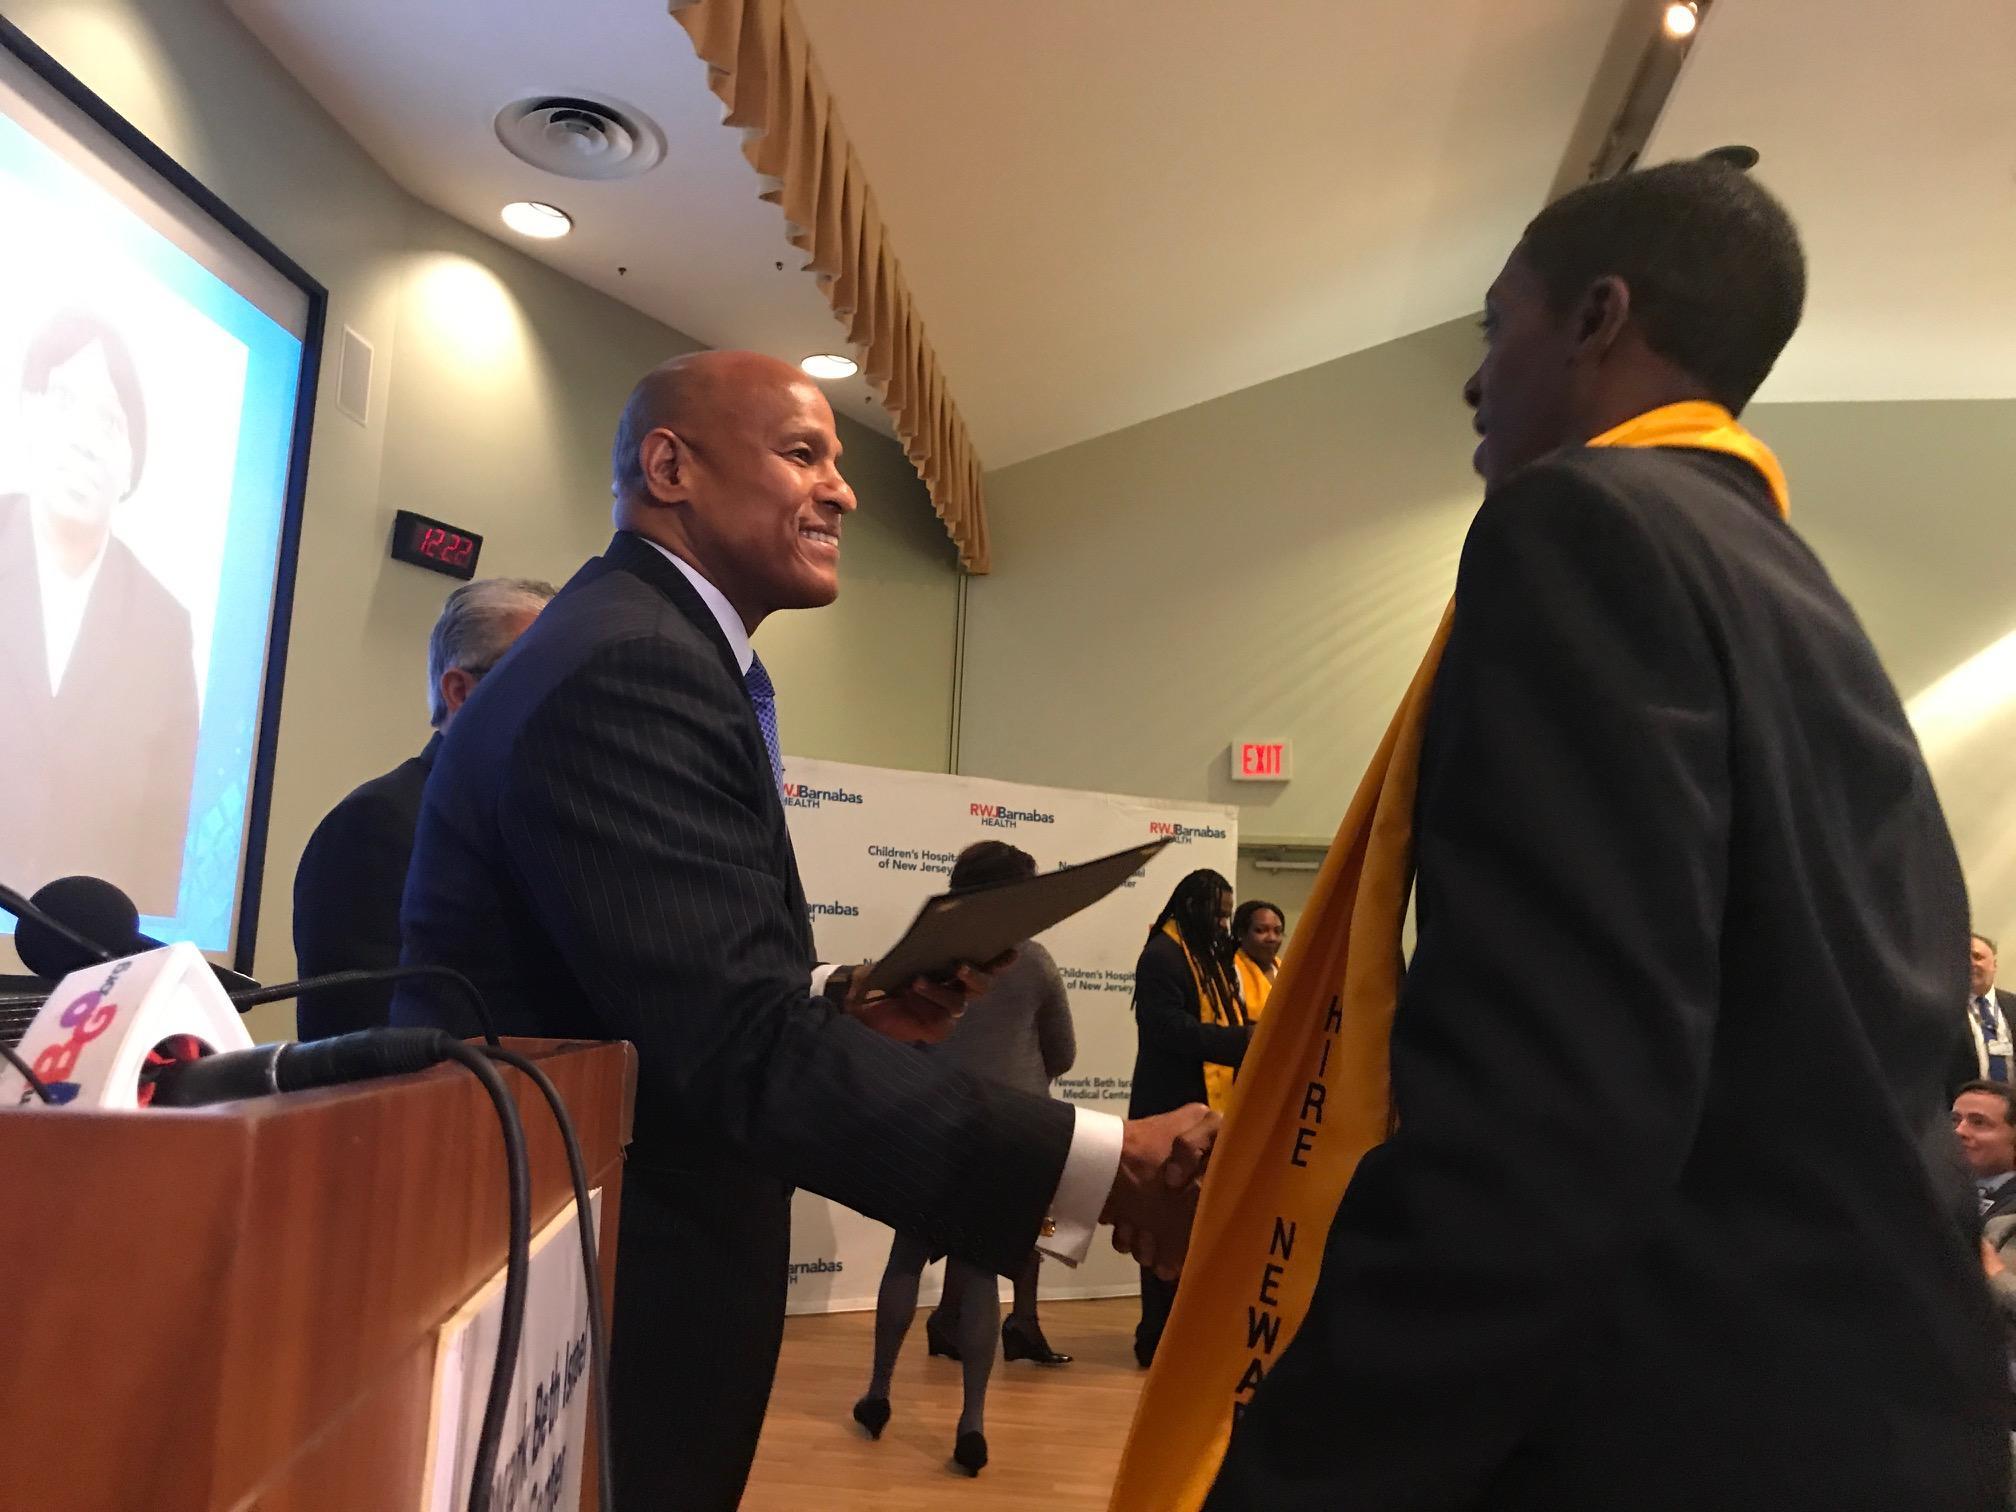 Hire Newark Providing More Than Just Jobs | WBGO